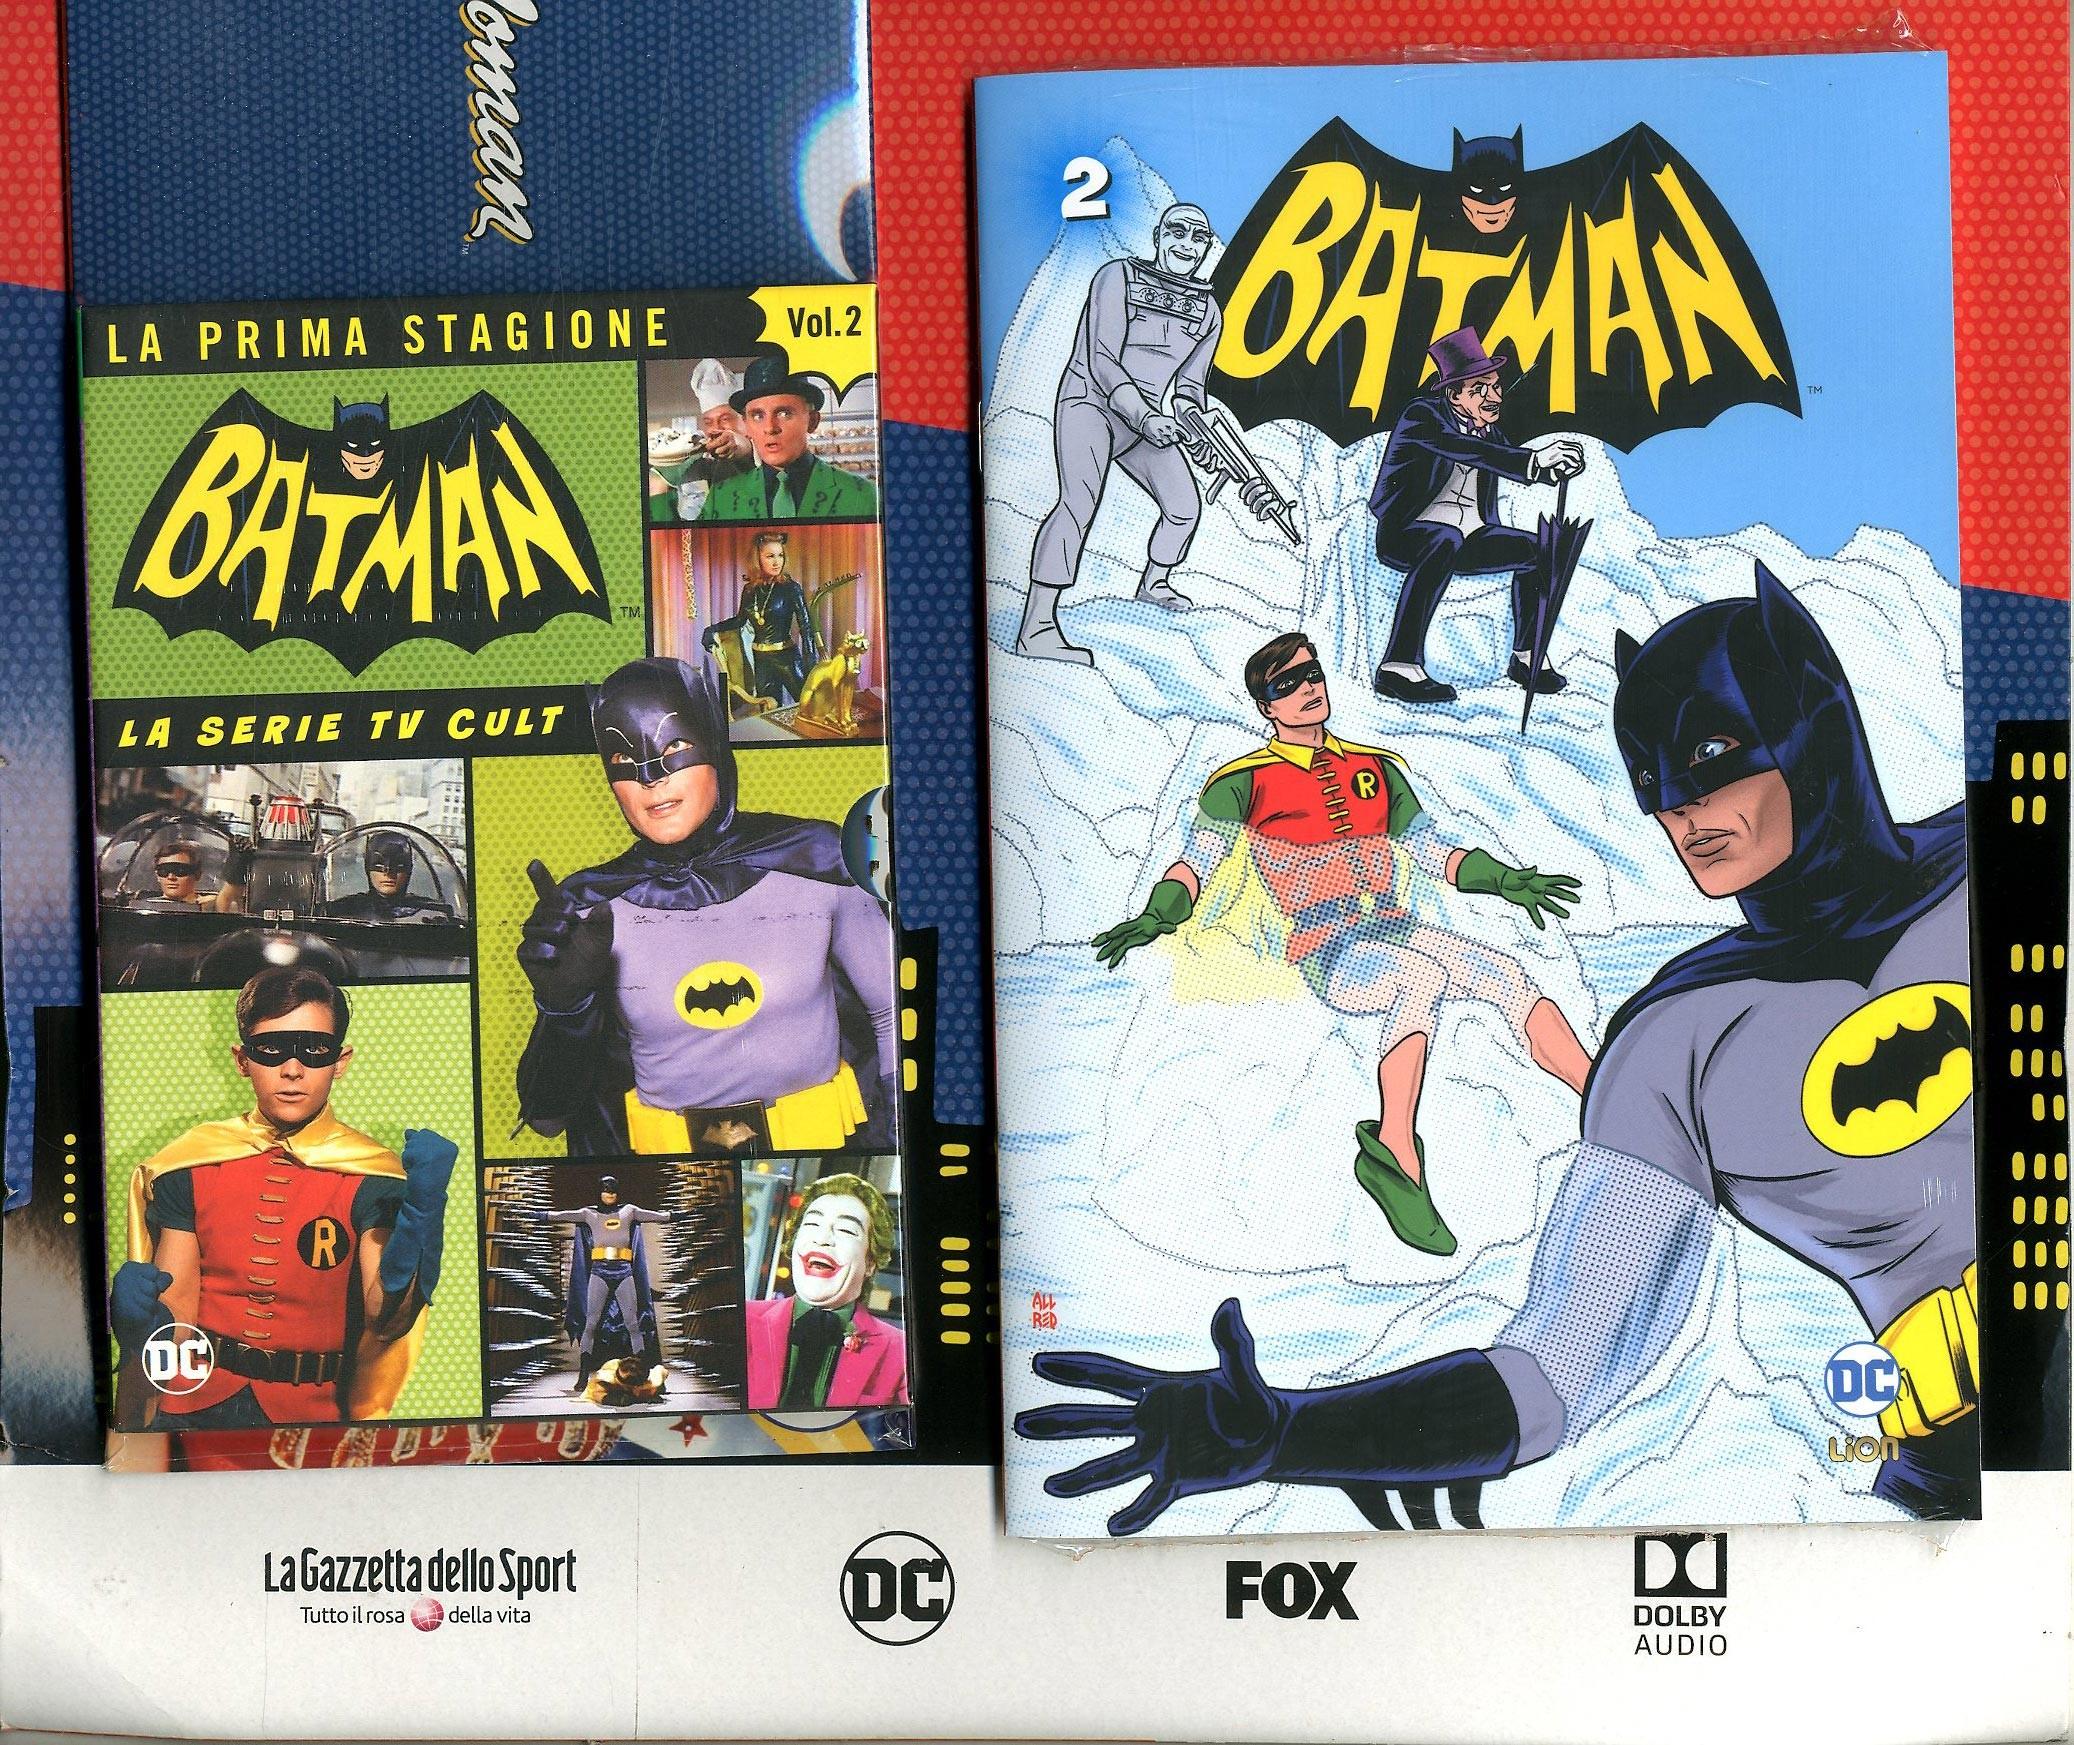 Batman '66 (Dvd + Fumetto) - N° 2 - Batman '66 - Rw Lion